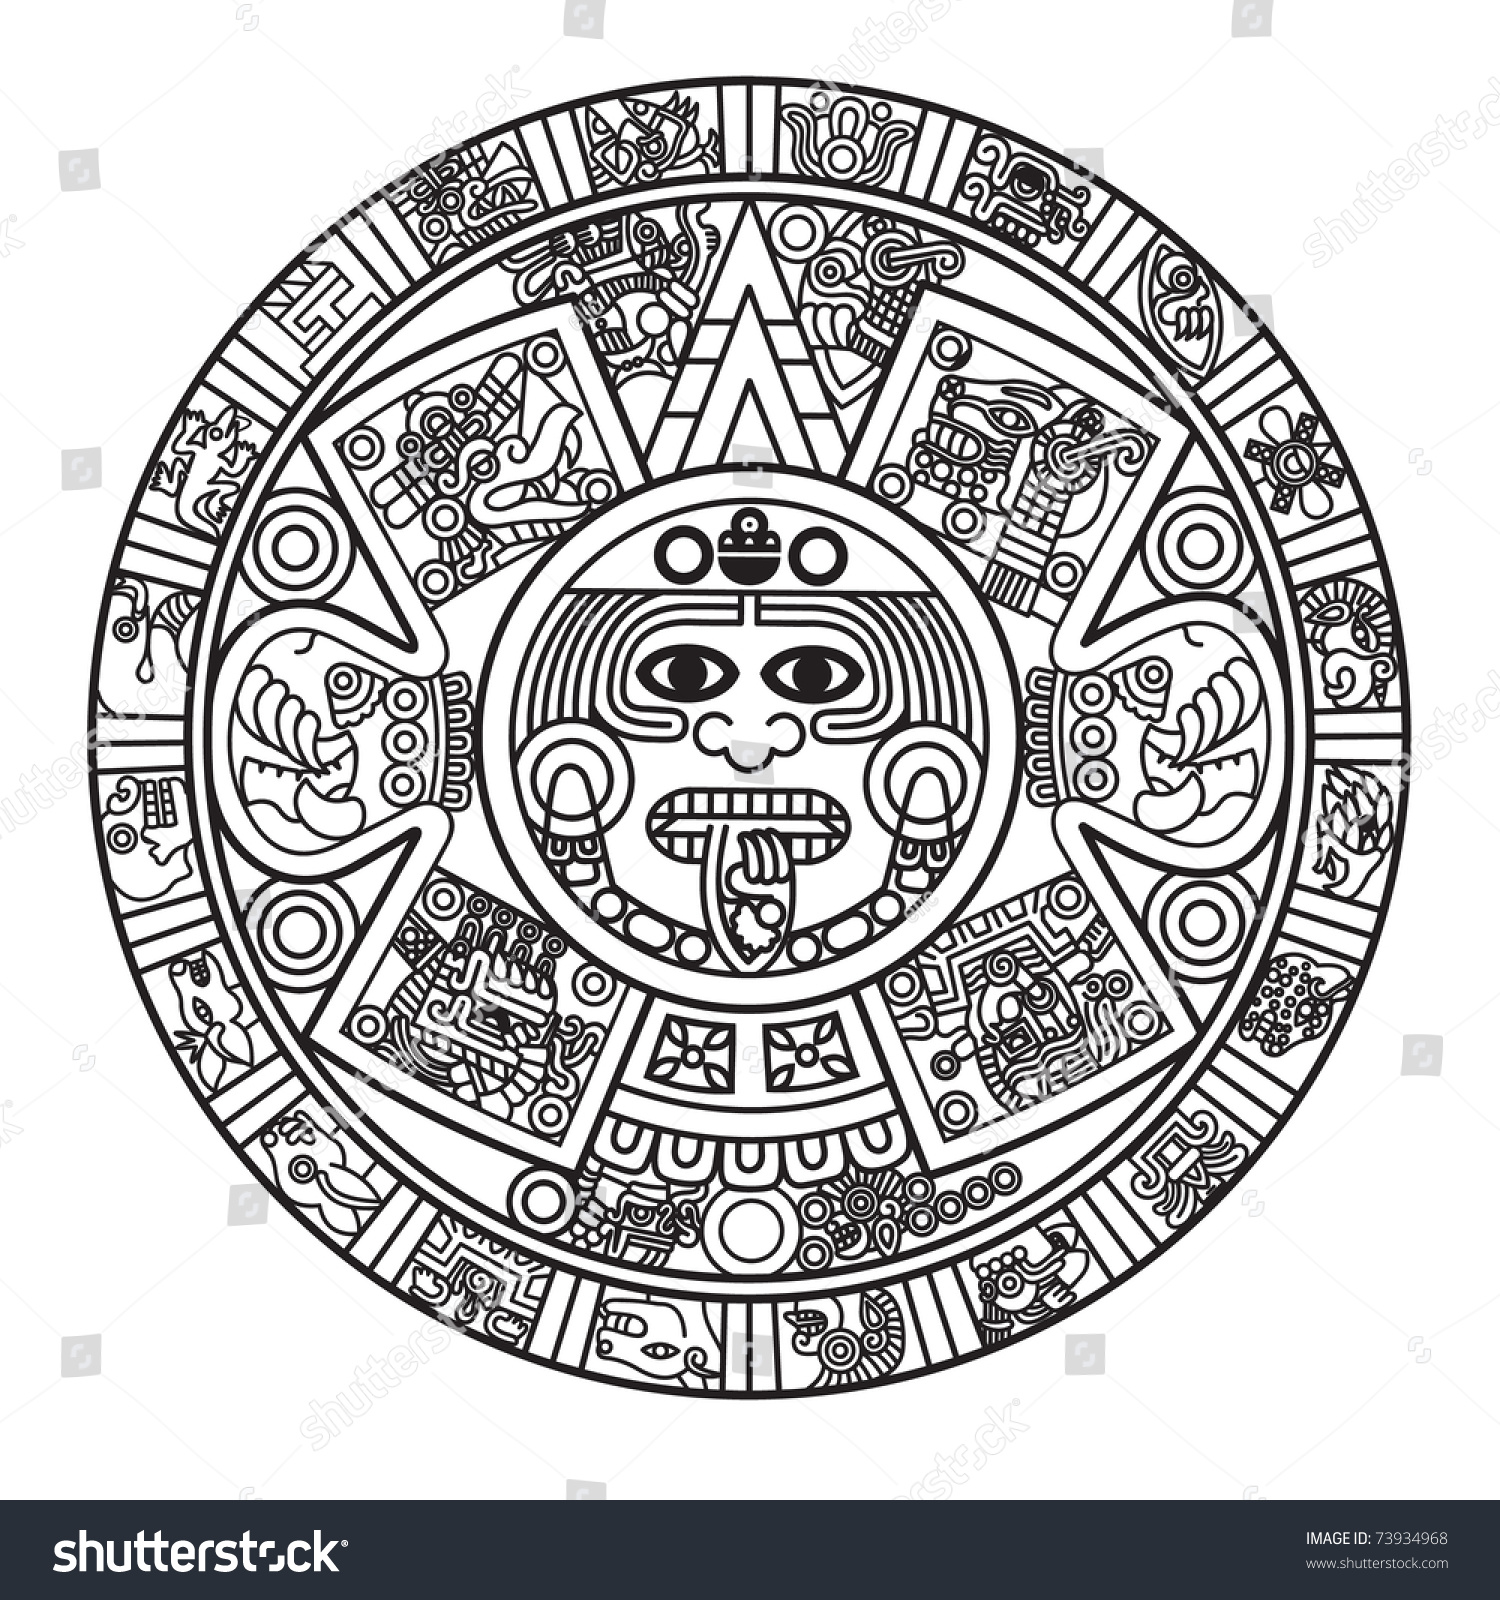 Mayan Calendar Drawing Easy : Aztec calendar yangah solen